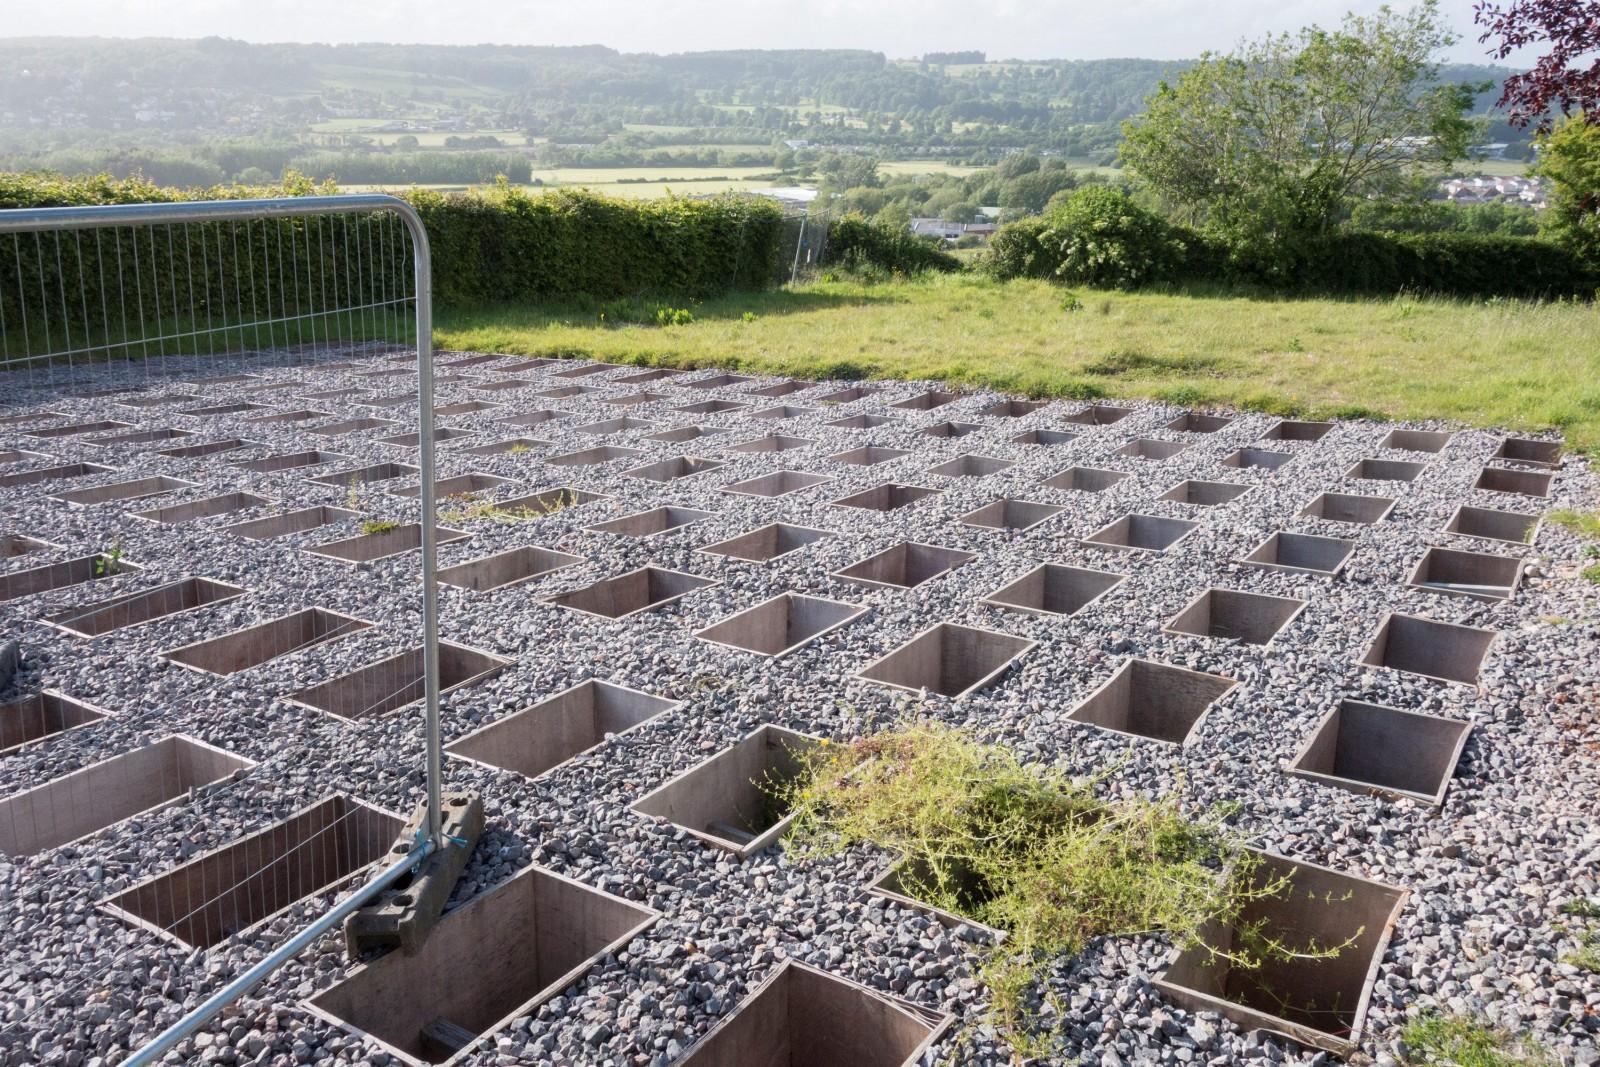 Sickening sight of tiny empty graves causes mum of stillborn baby further anguish